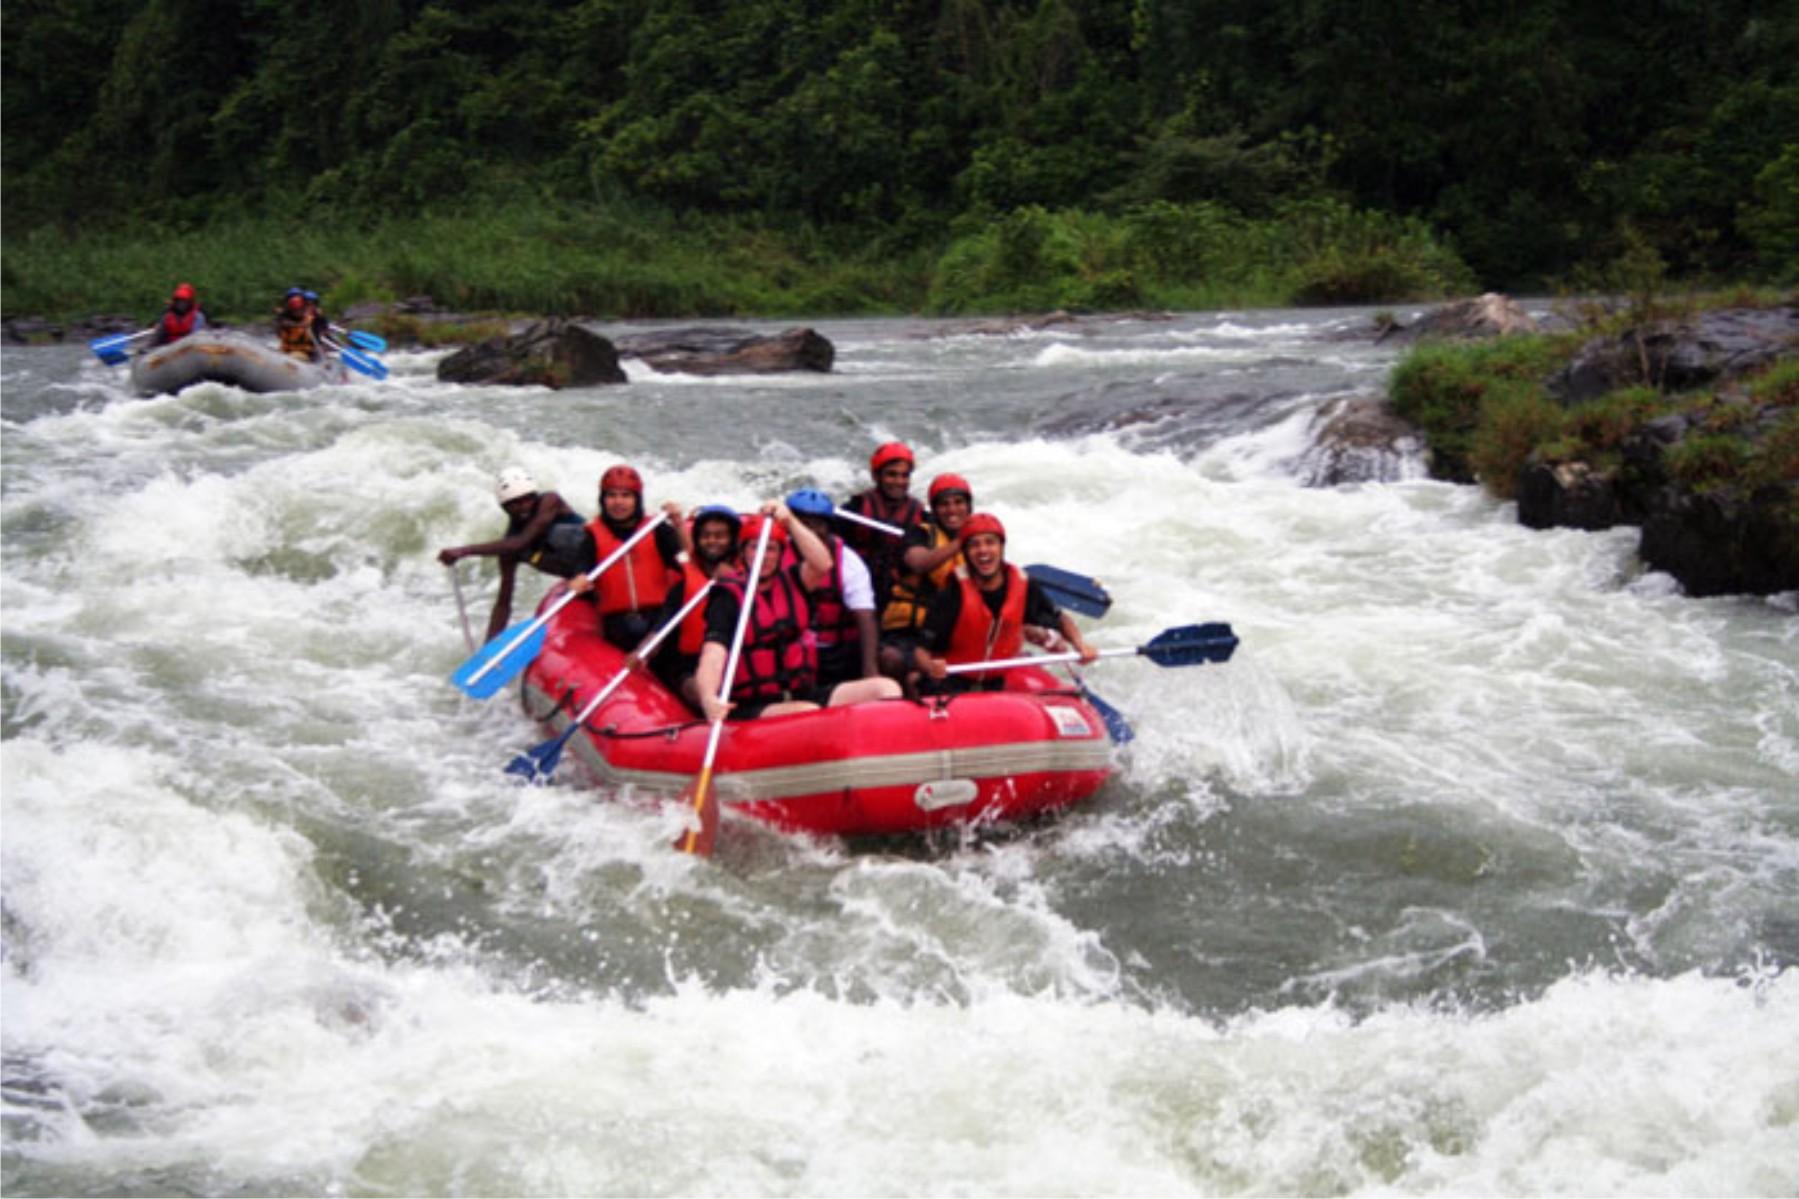 Kitulgala White Water Rafting March 26 2015 Noori Insaf